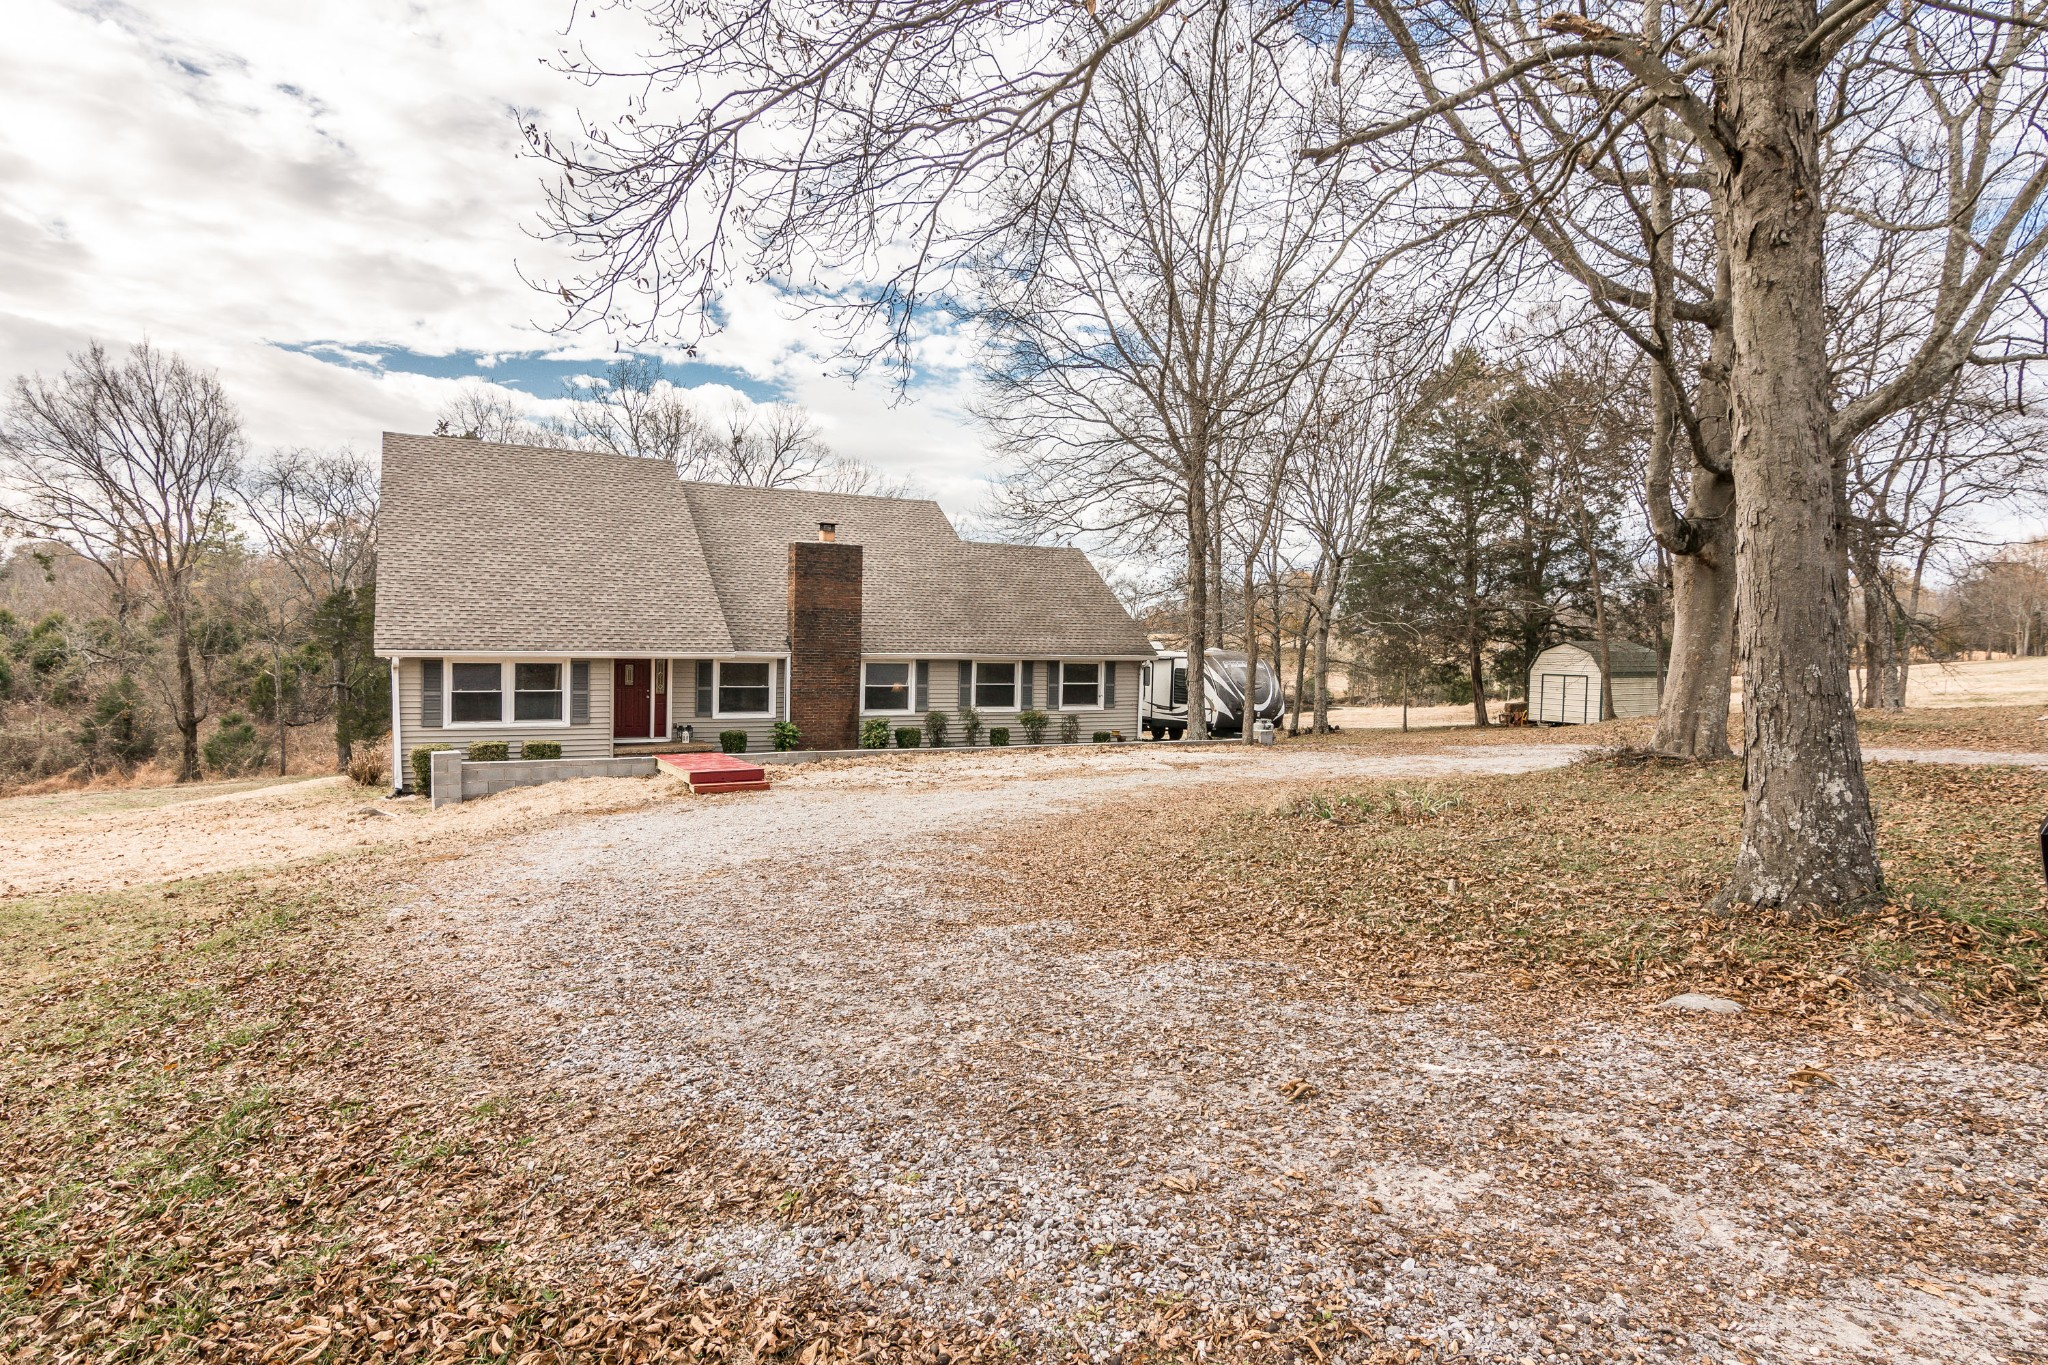 6965 Highway 231, N, Bethpage, TN 37022 - Bethpage, TN real estate listing